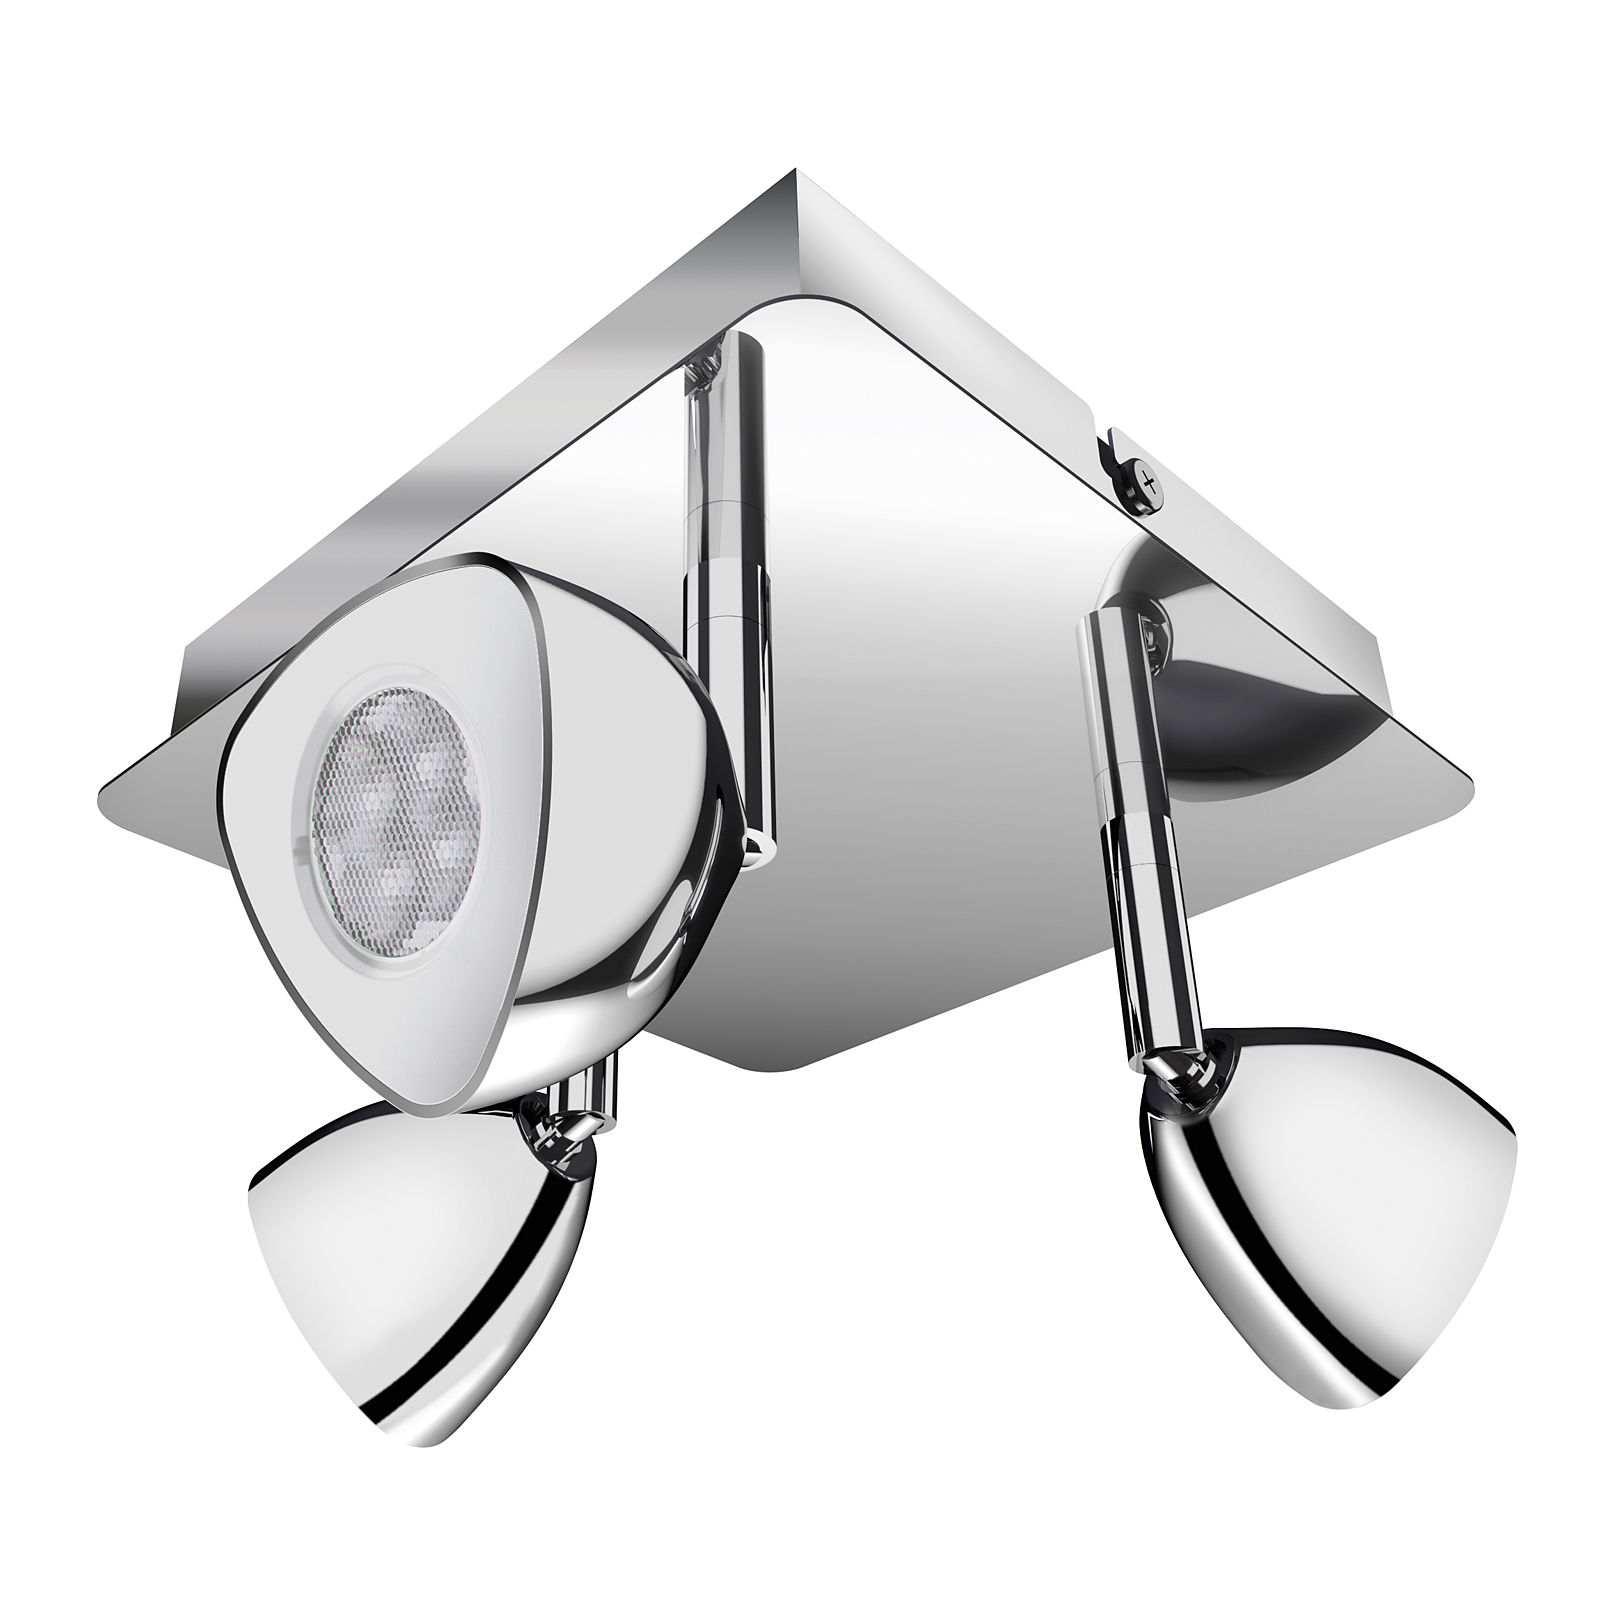 osram calyx triple spot led deckenleuchte 15w 970 lumen. Black Bedroom Furniture Sets. Home Design Ideas